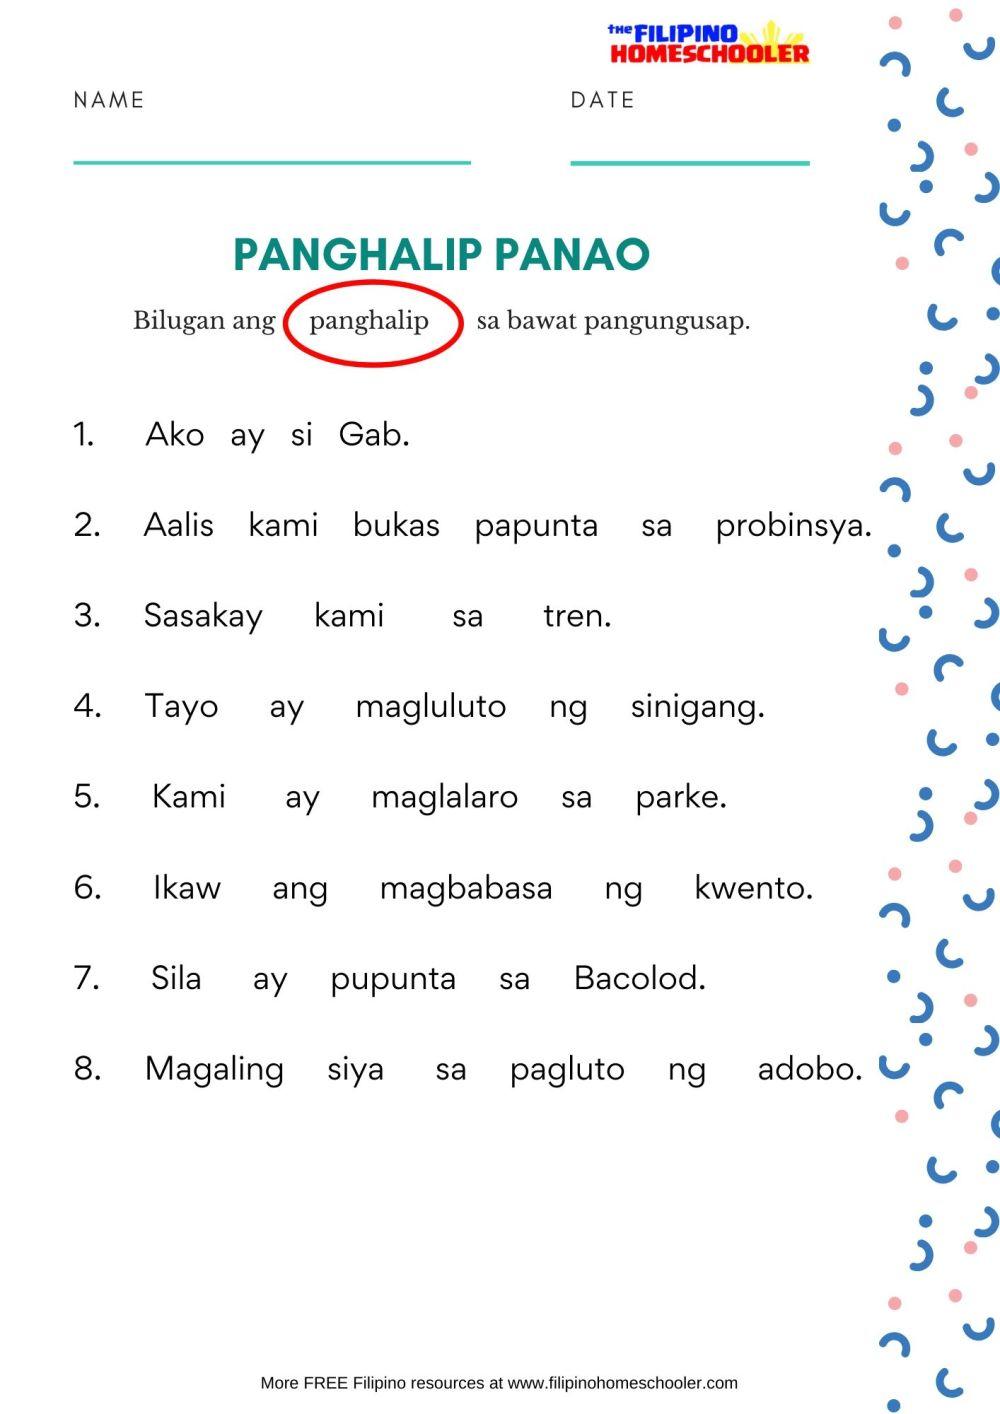 medium resolution of Free Panghalip Panao Worksheet SET 1 — The Filipino Homeschooler